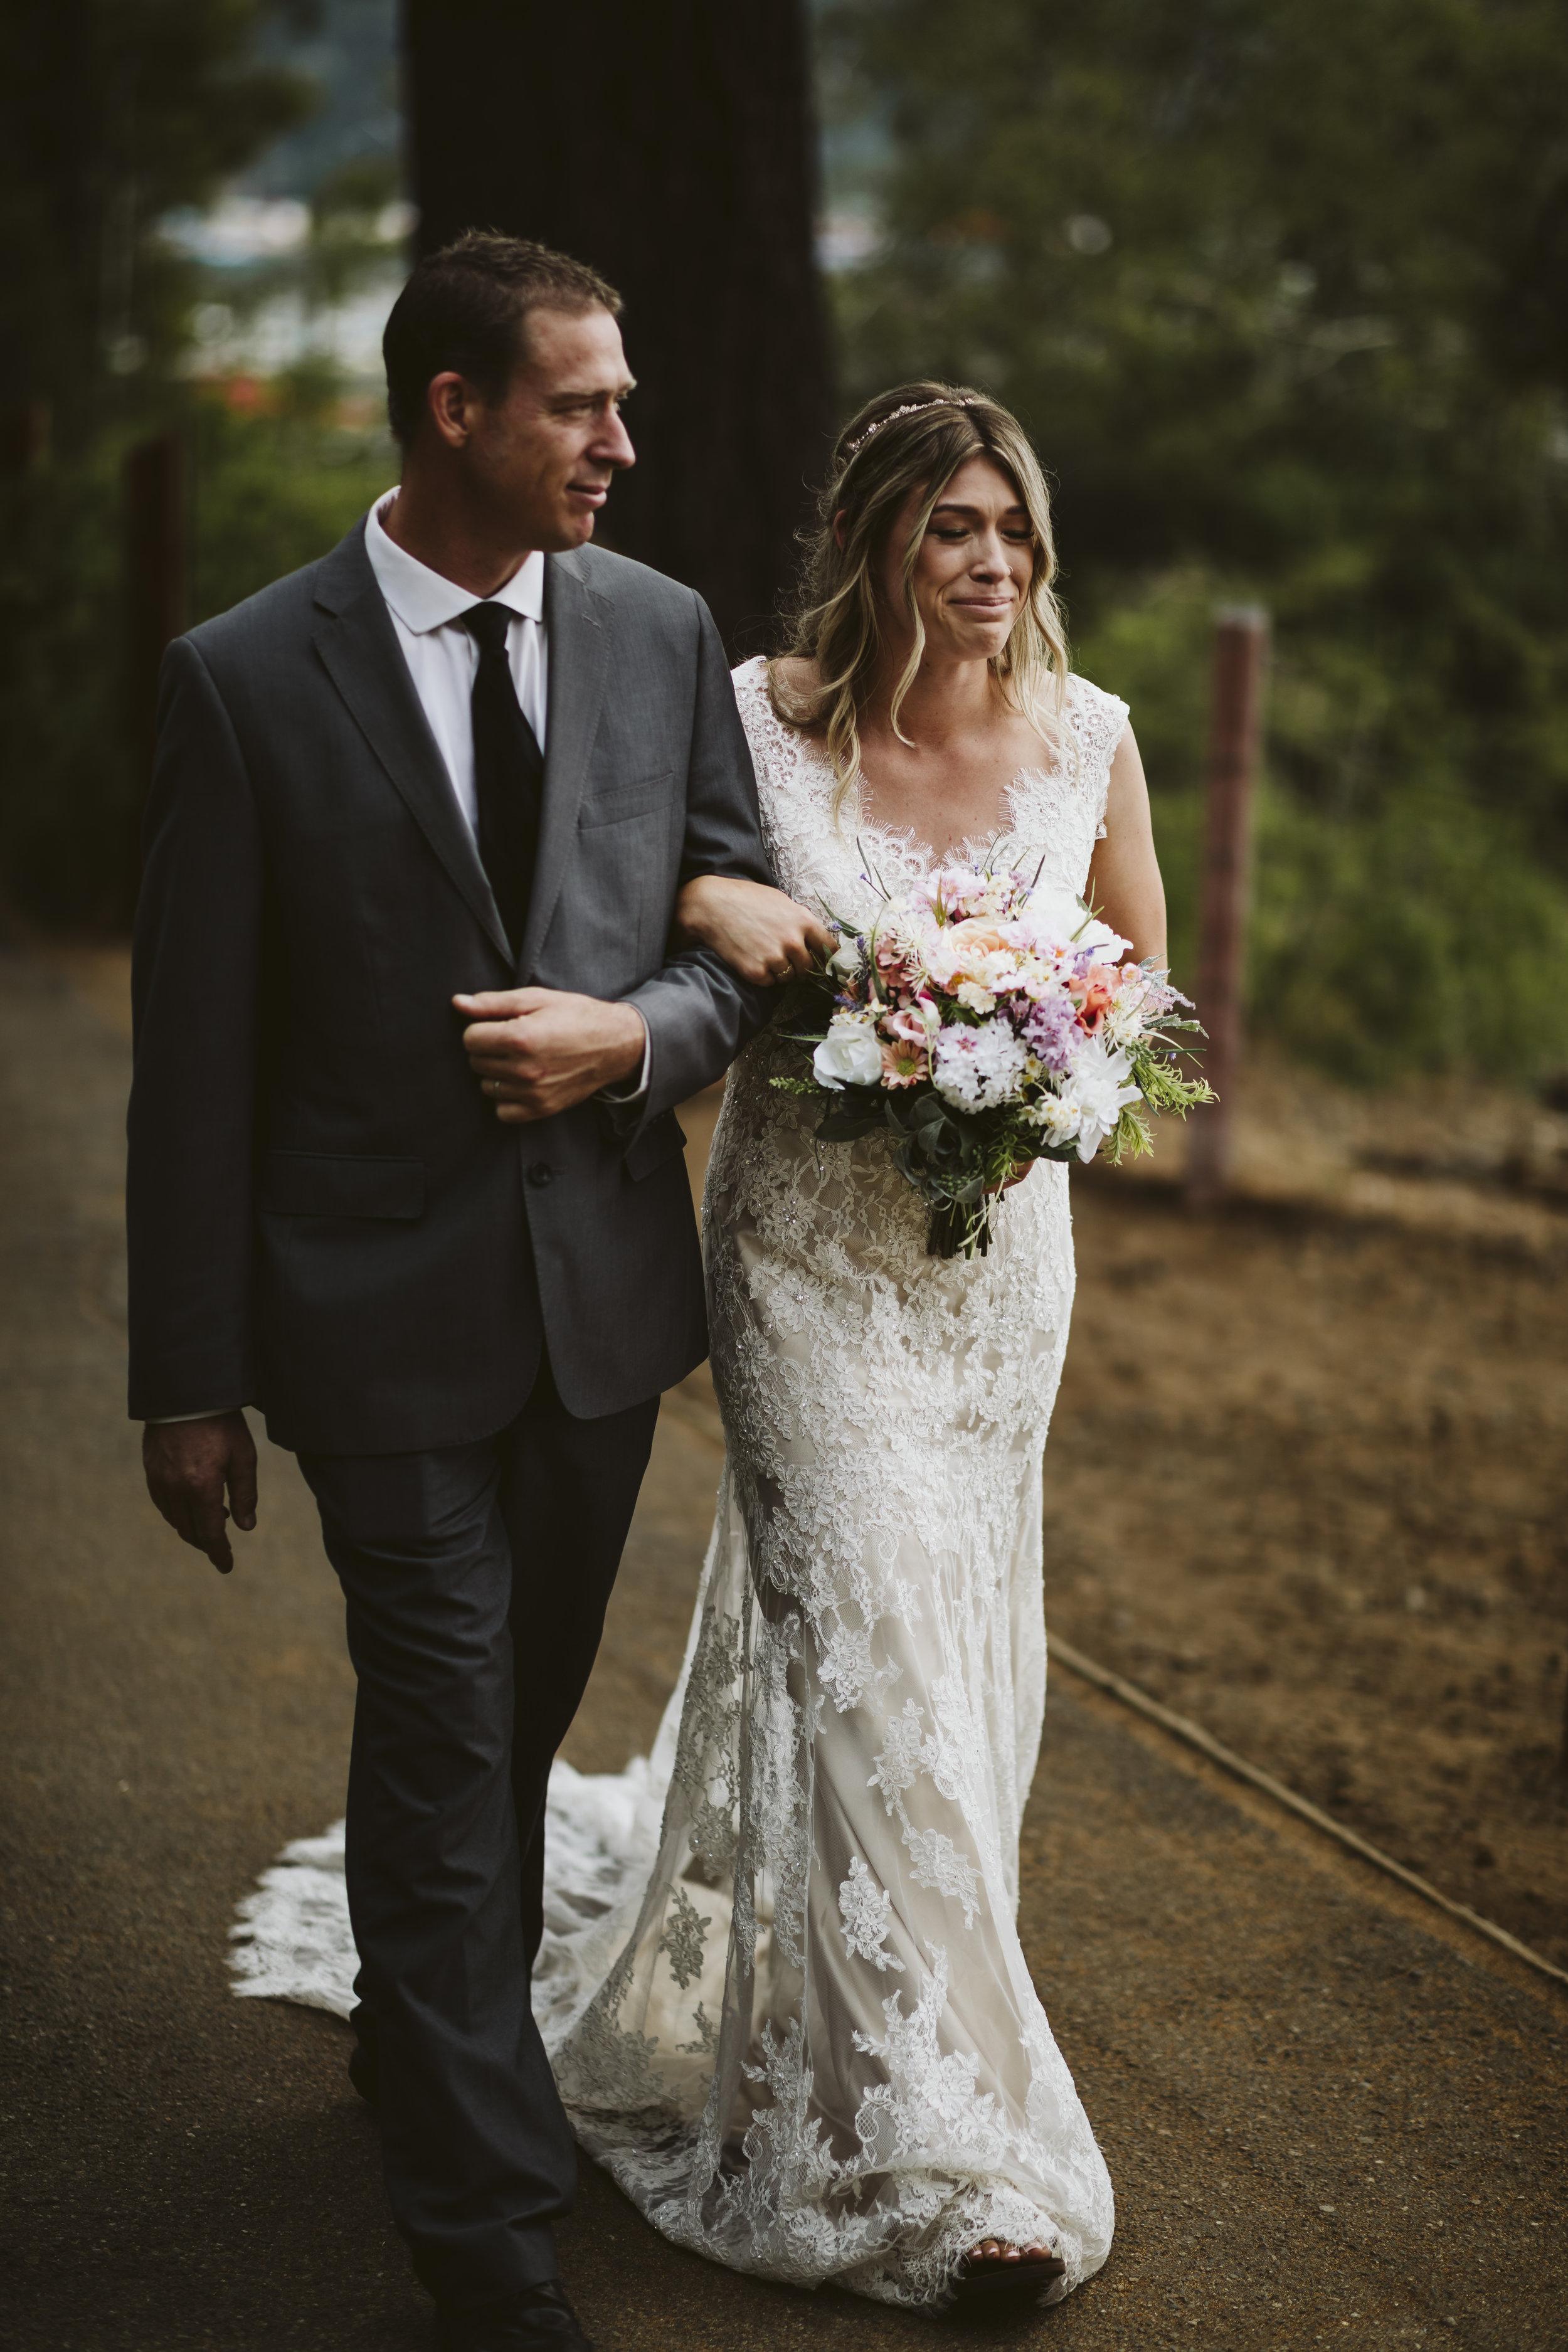 _P8A4194vild-vild photography-photography-wedding-wedding photography-tahoe-lake tahoe-lake tahoe wedding photographer-nevada wedding photographer-mountain wedding.jpg